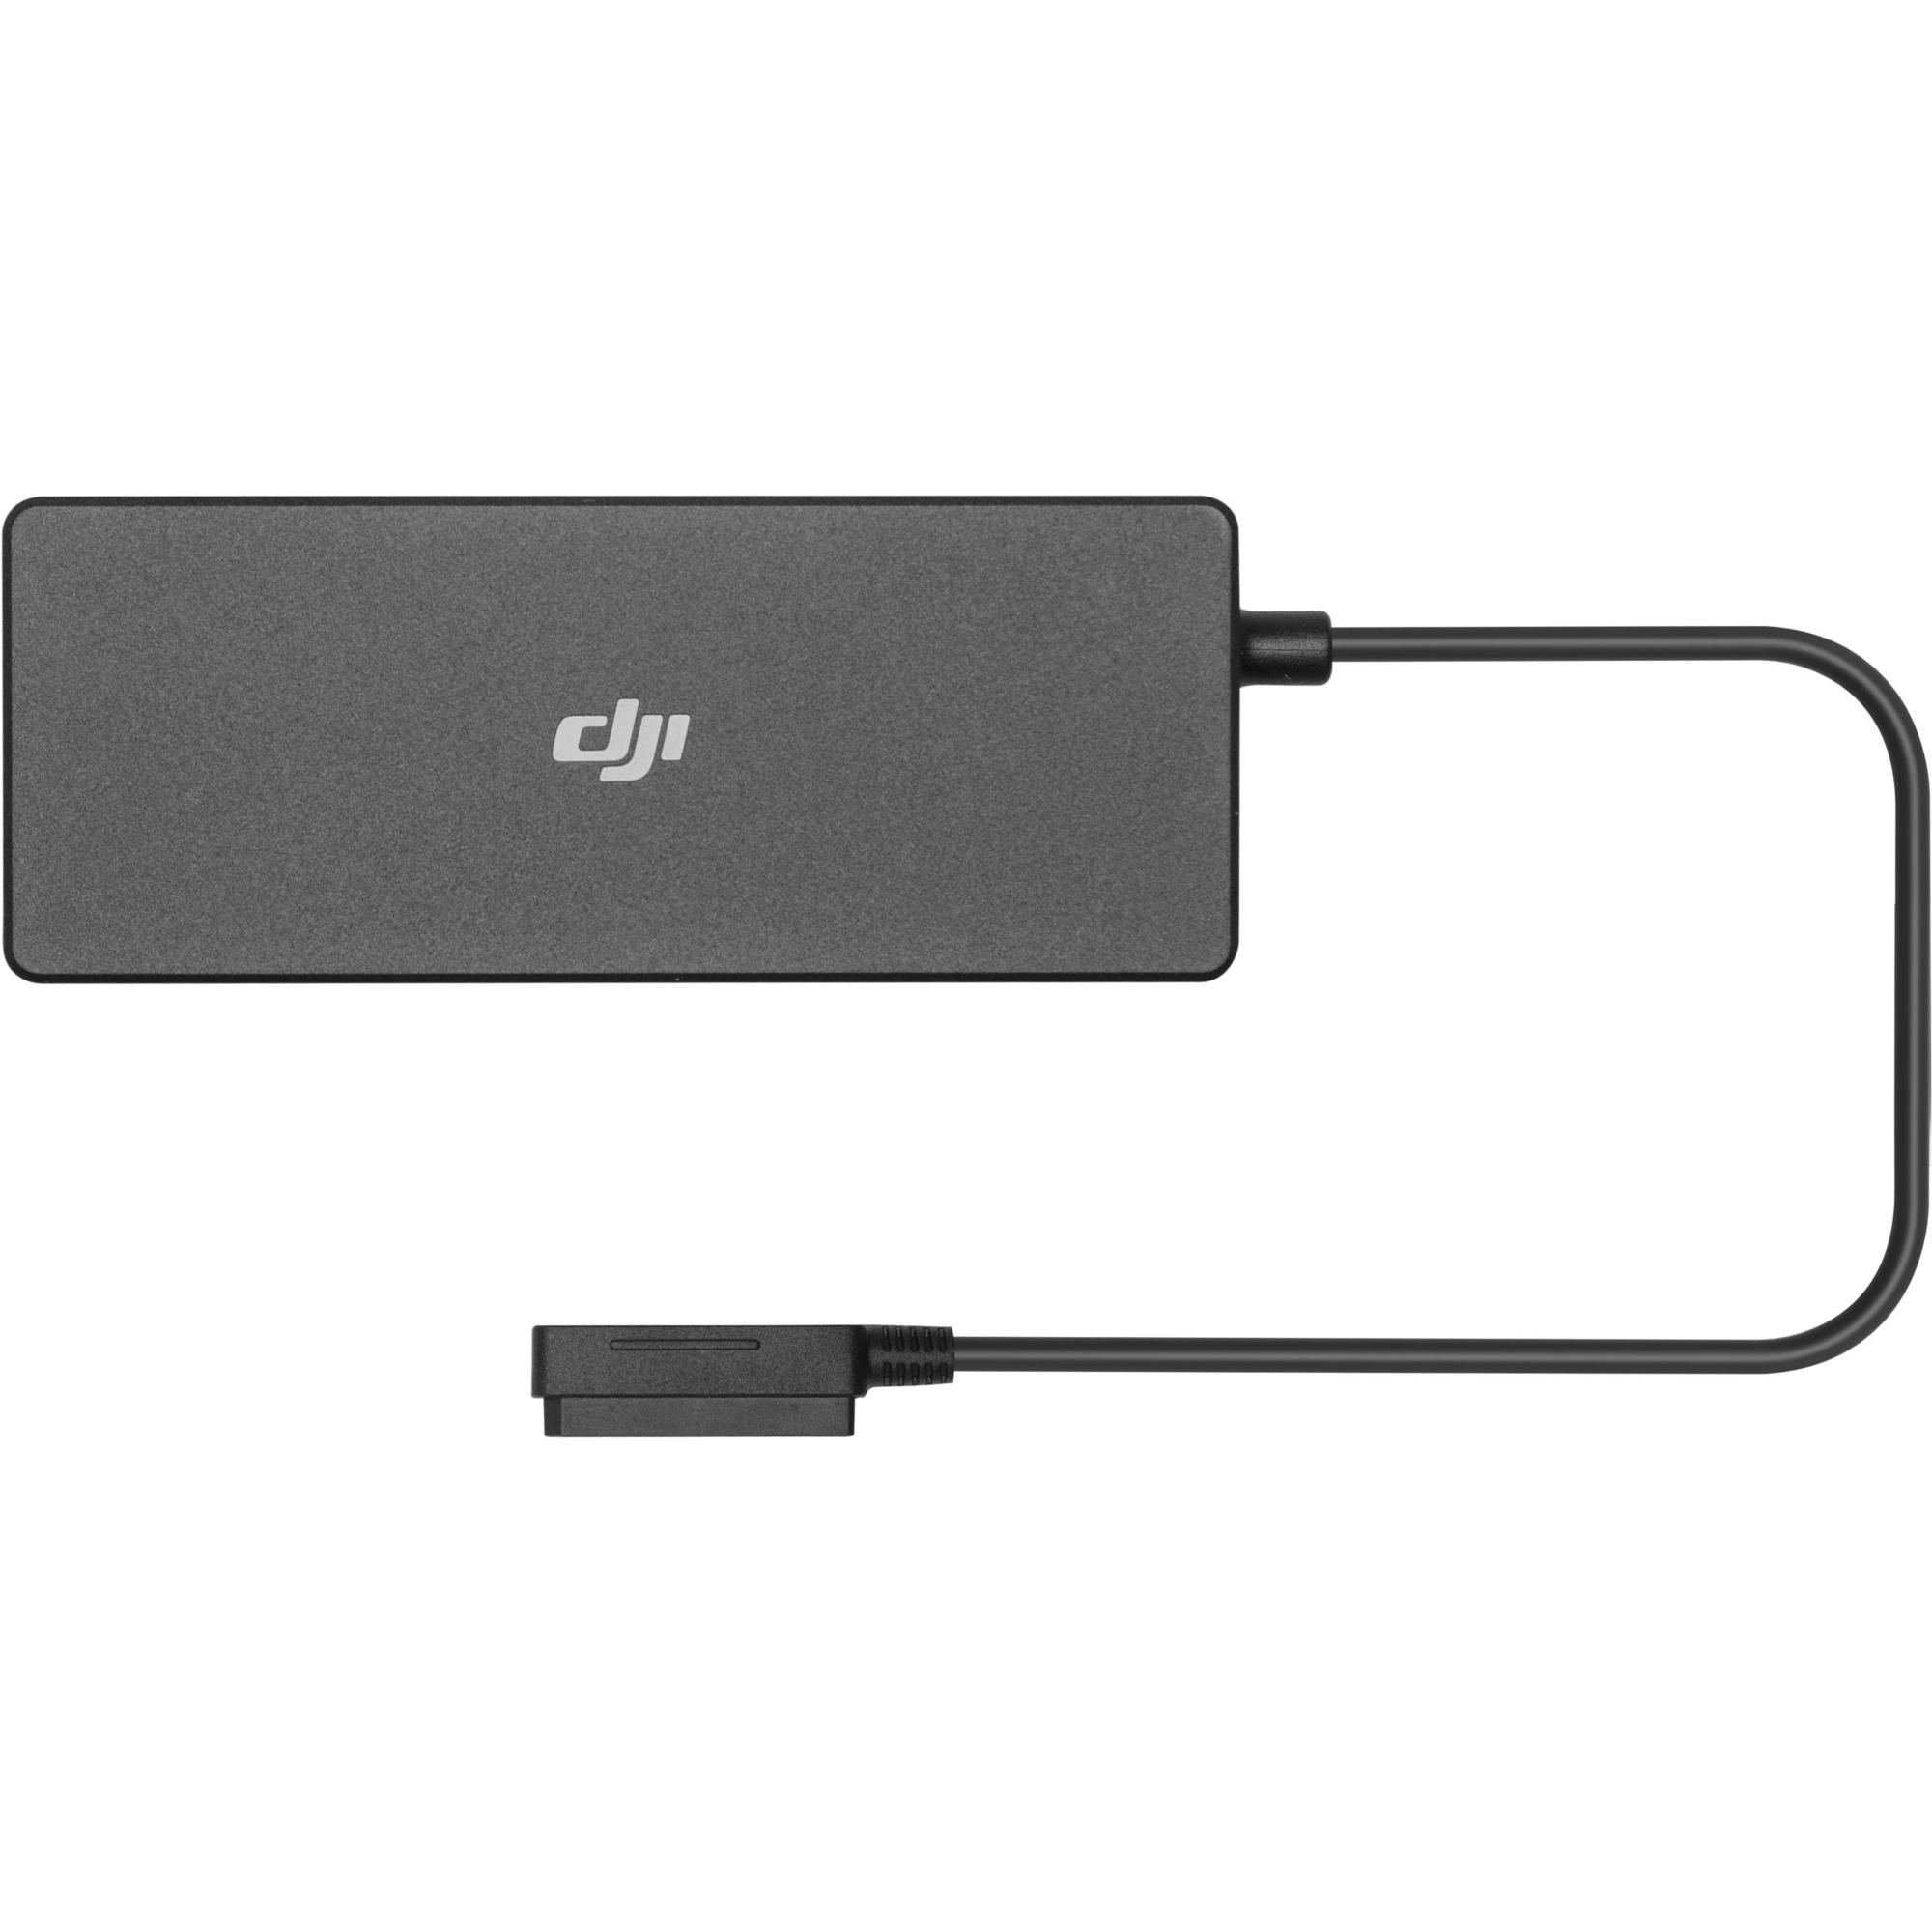 017_dji-mavic-air-2-battery-charger-box-45288.jpg